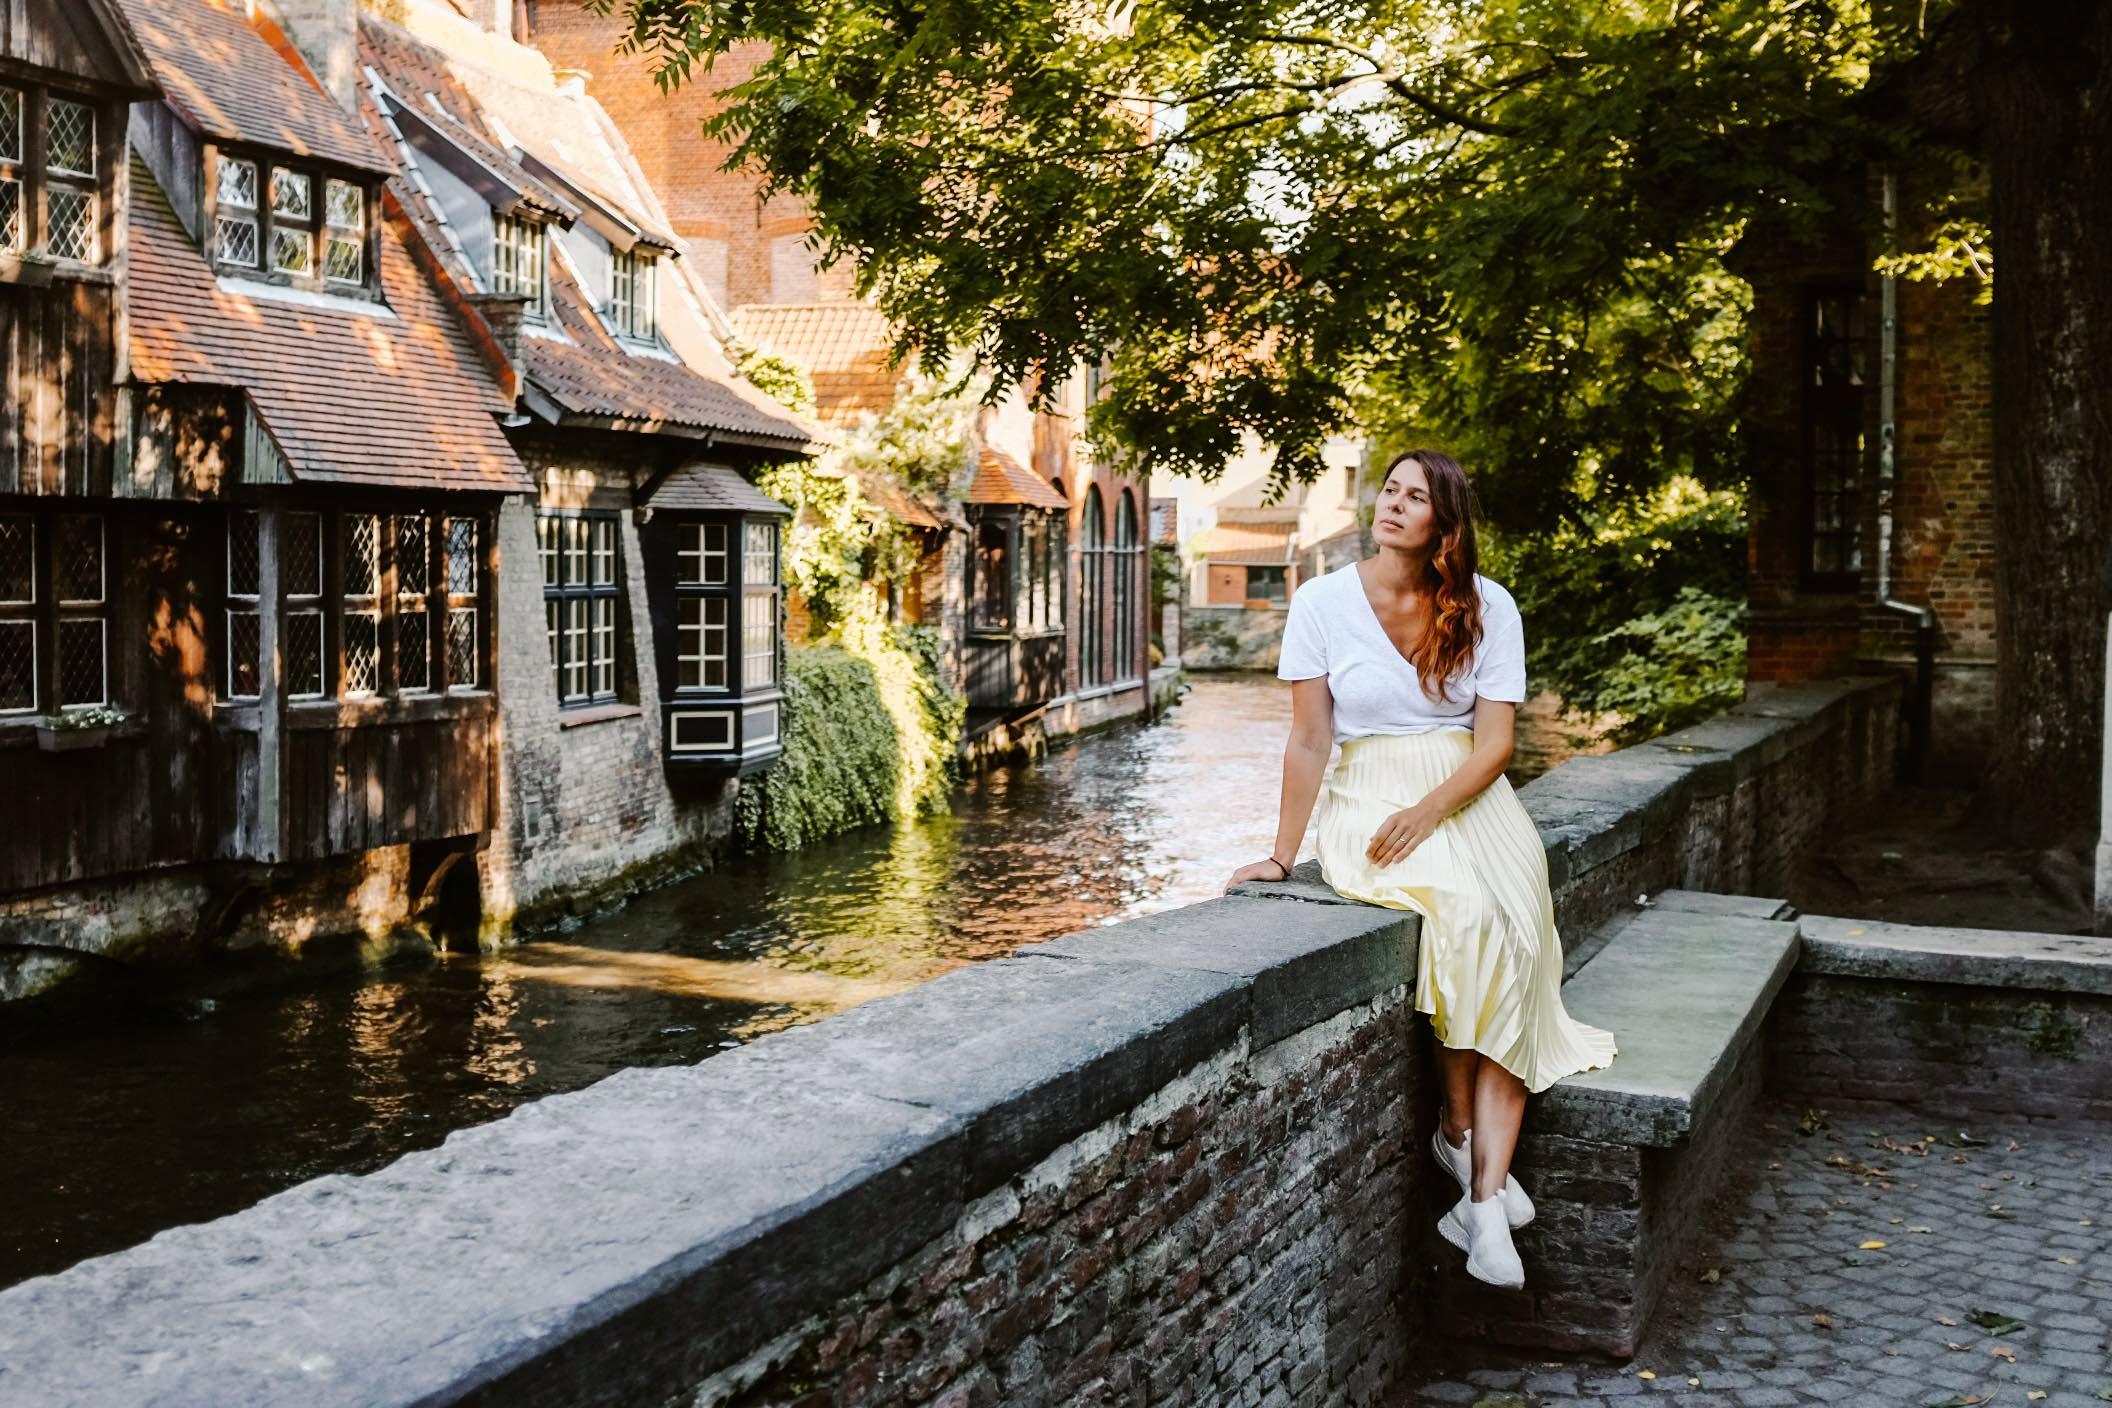 2 giorni a Bruges: Bonifatiusburg ragazza seduta su muretto